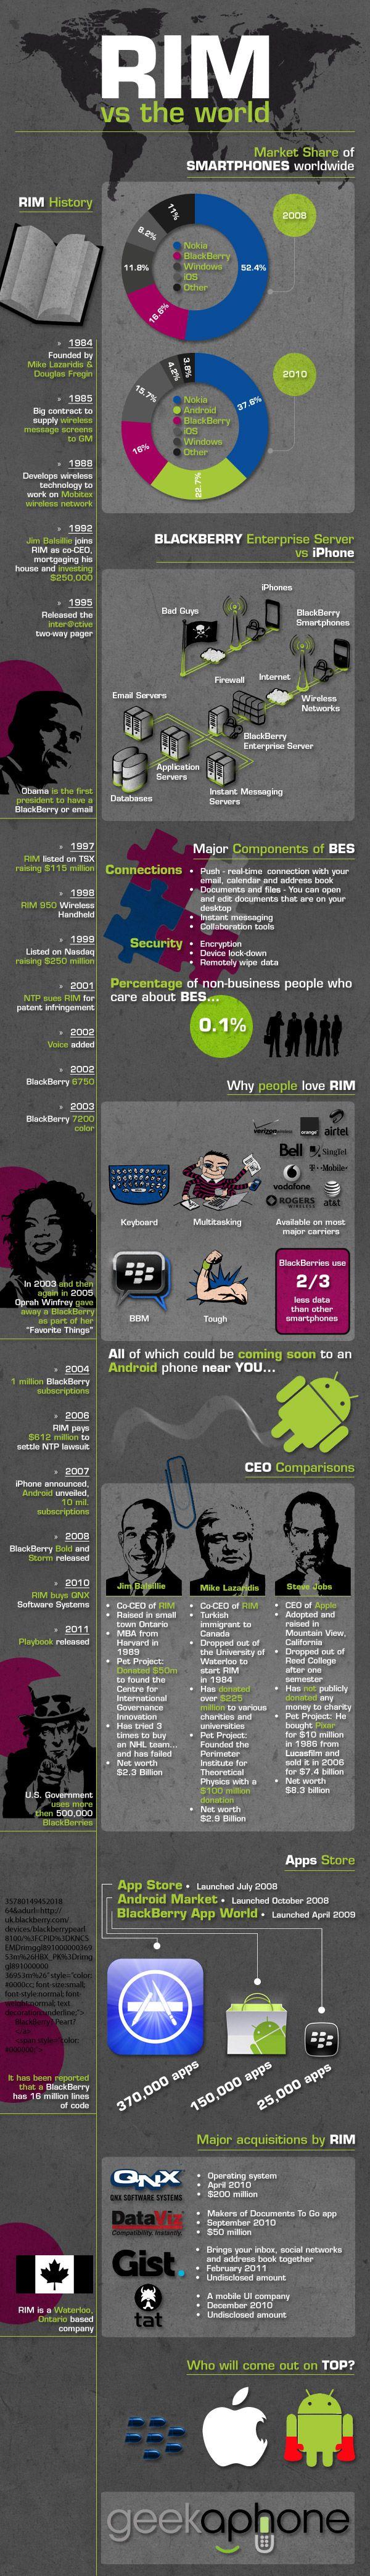 Blackberry/RIM Marketshare of Smartphones worldwide. #infographic #blackberry #smartphone